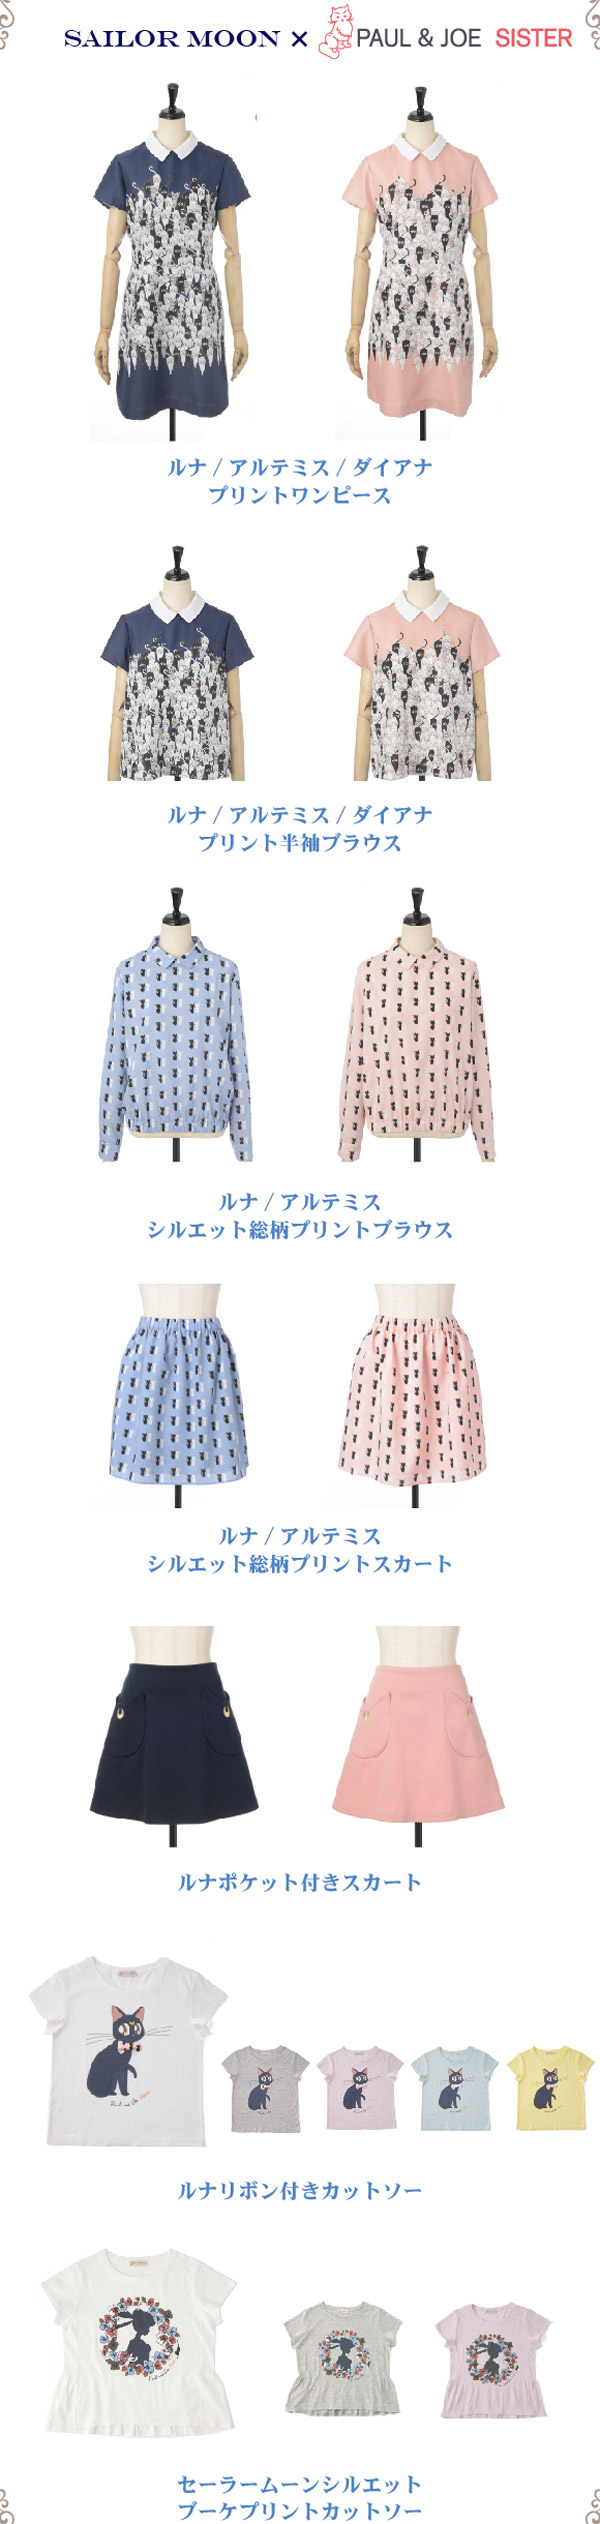 sailormoon-paul-joe-sister-apparel-collaboration-fashion2016